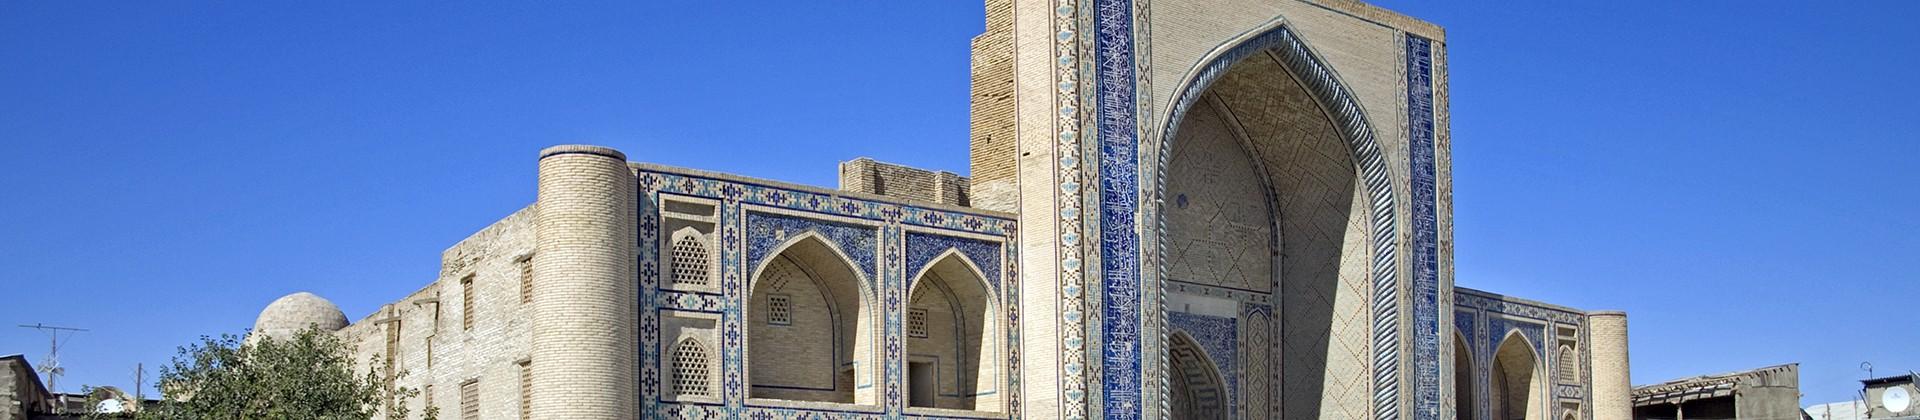 Legendary Uzbekistan Standard - 1